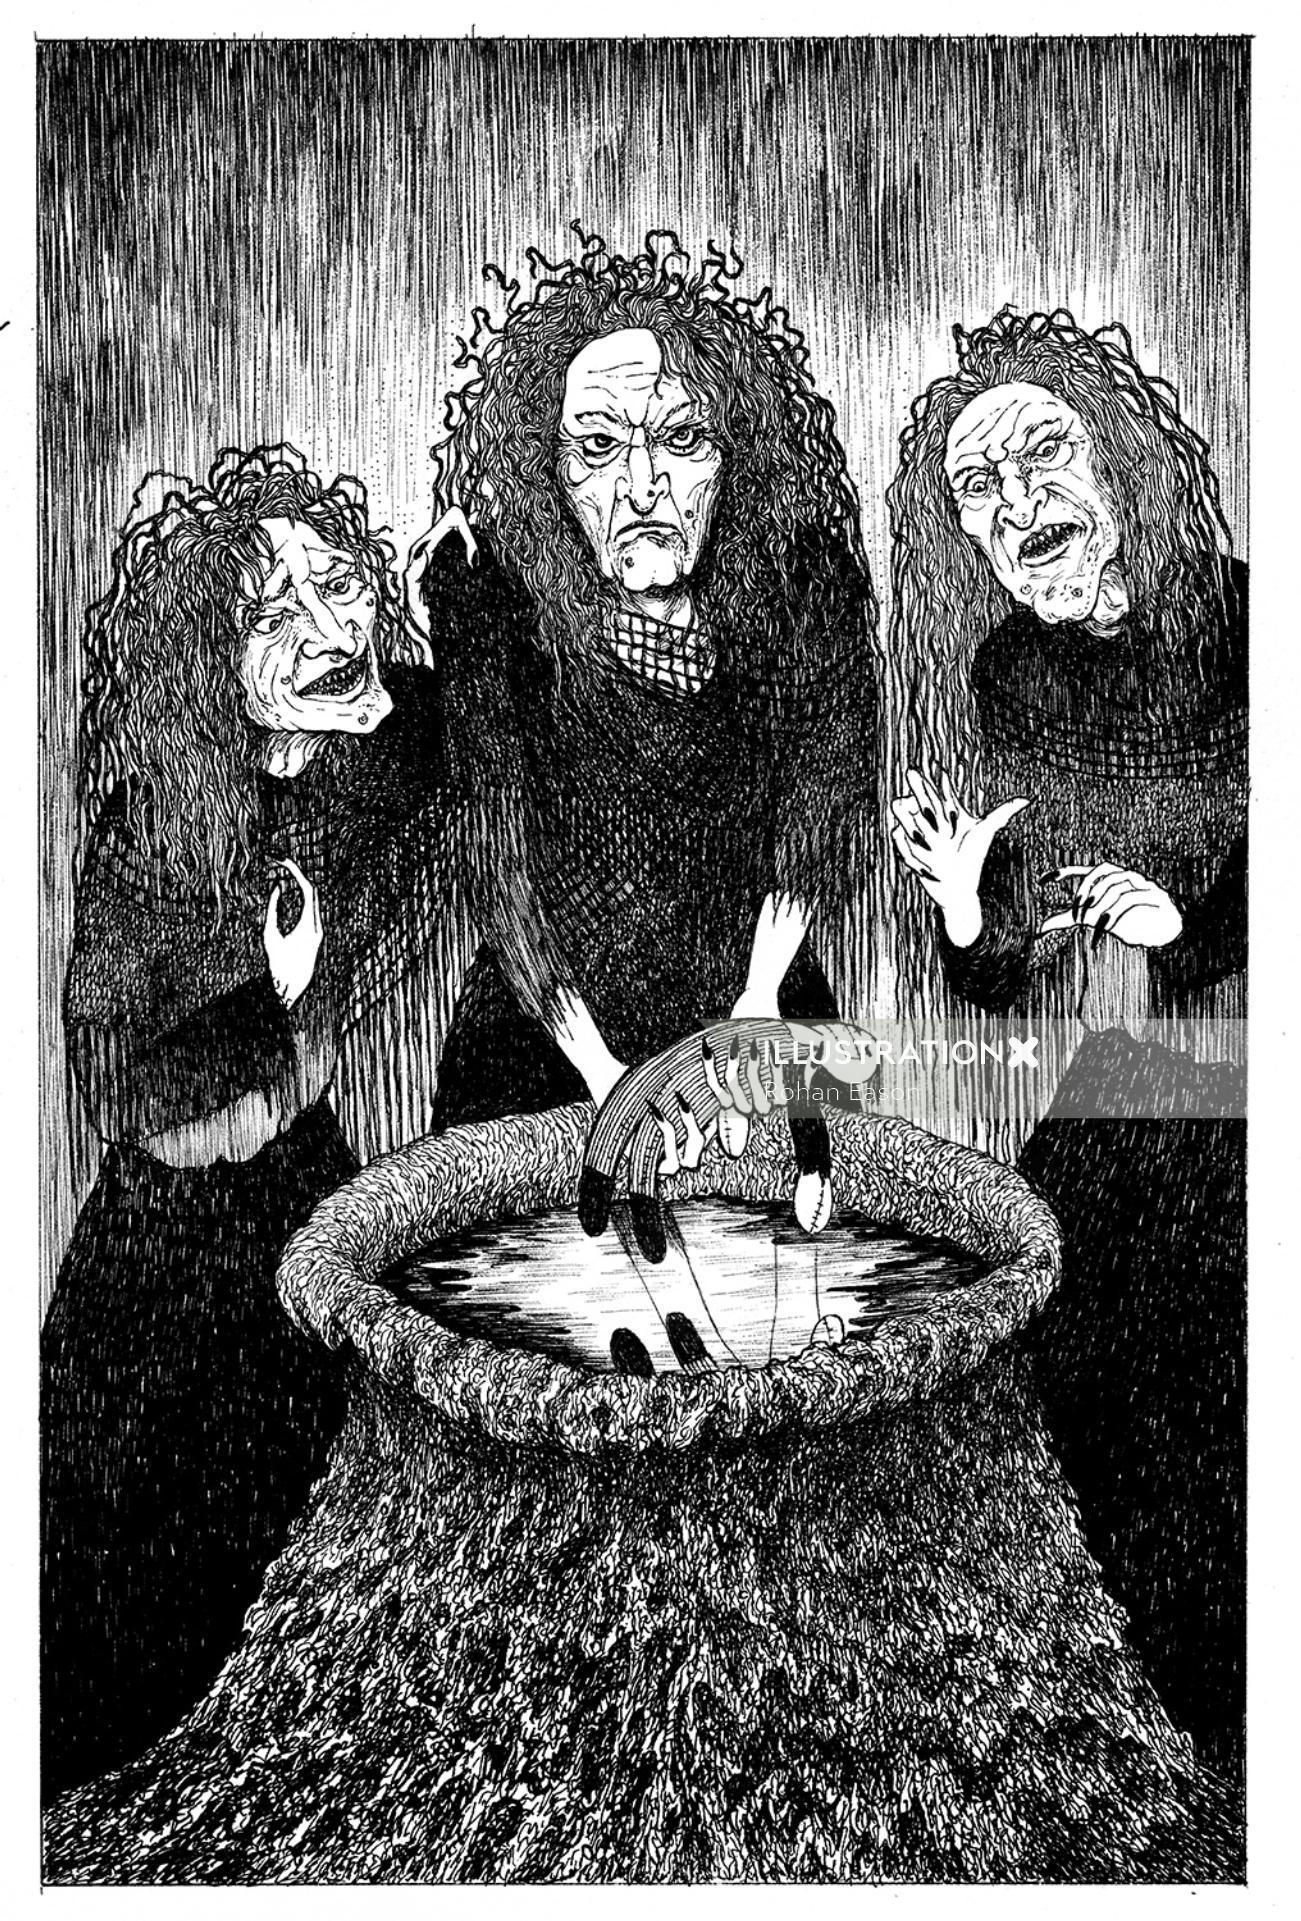 Black & white sketch of three female monsters